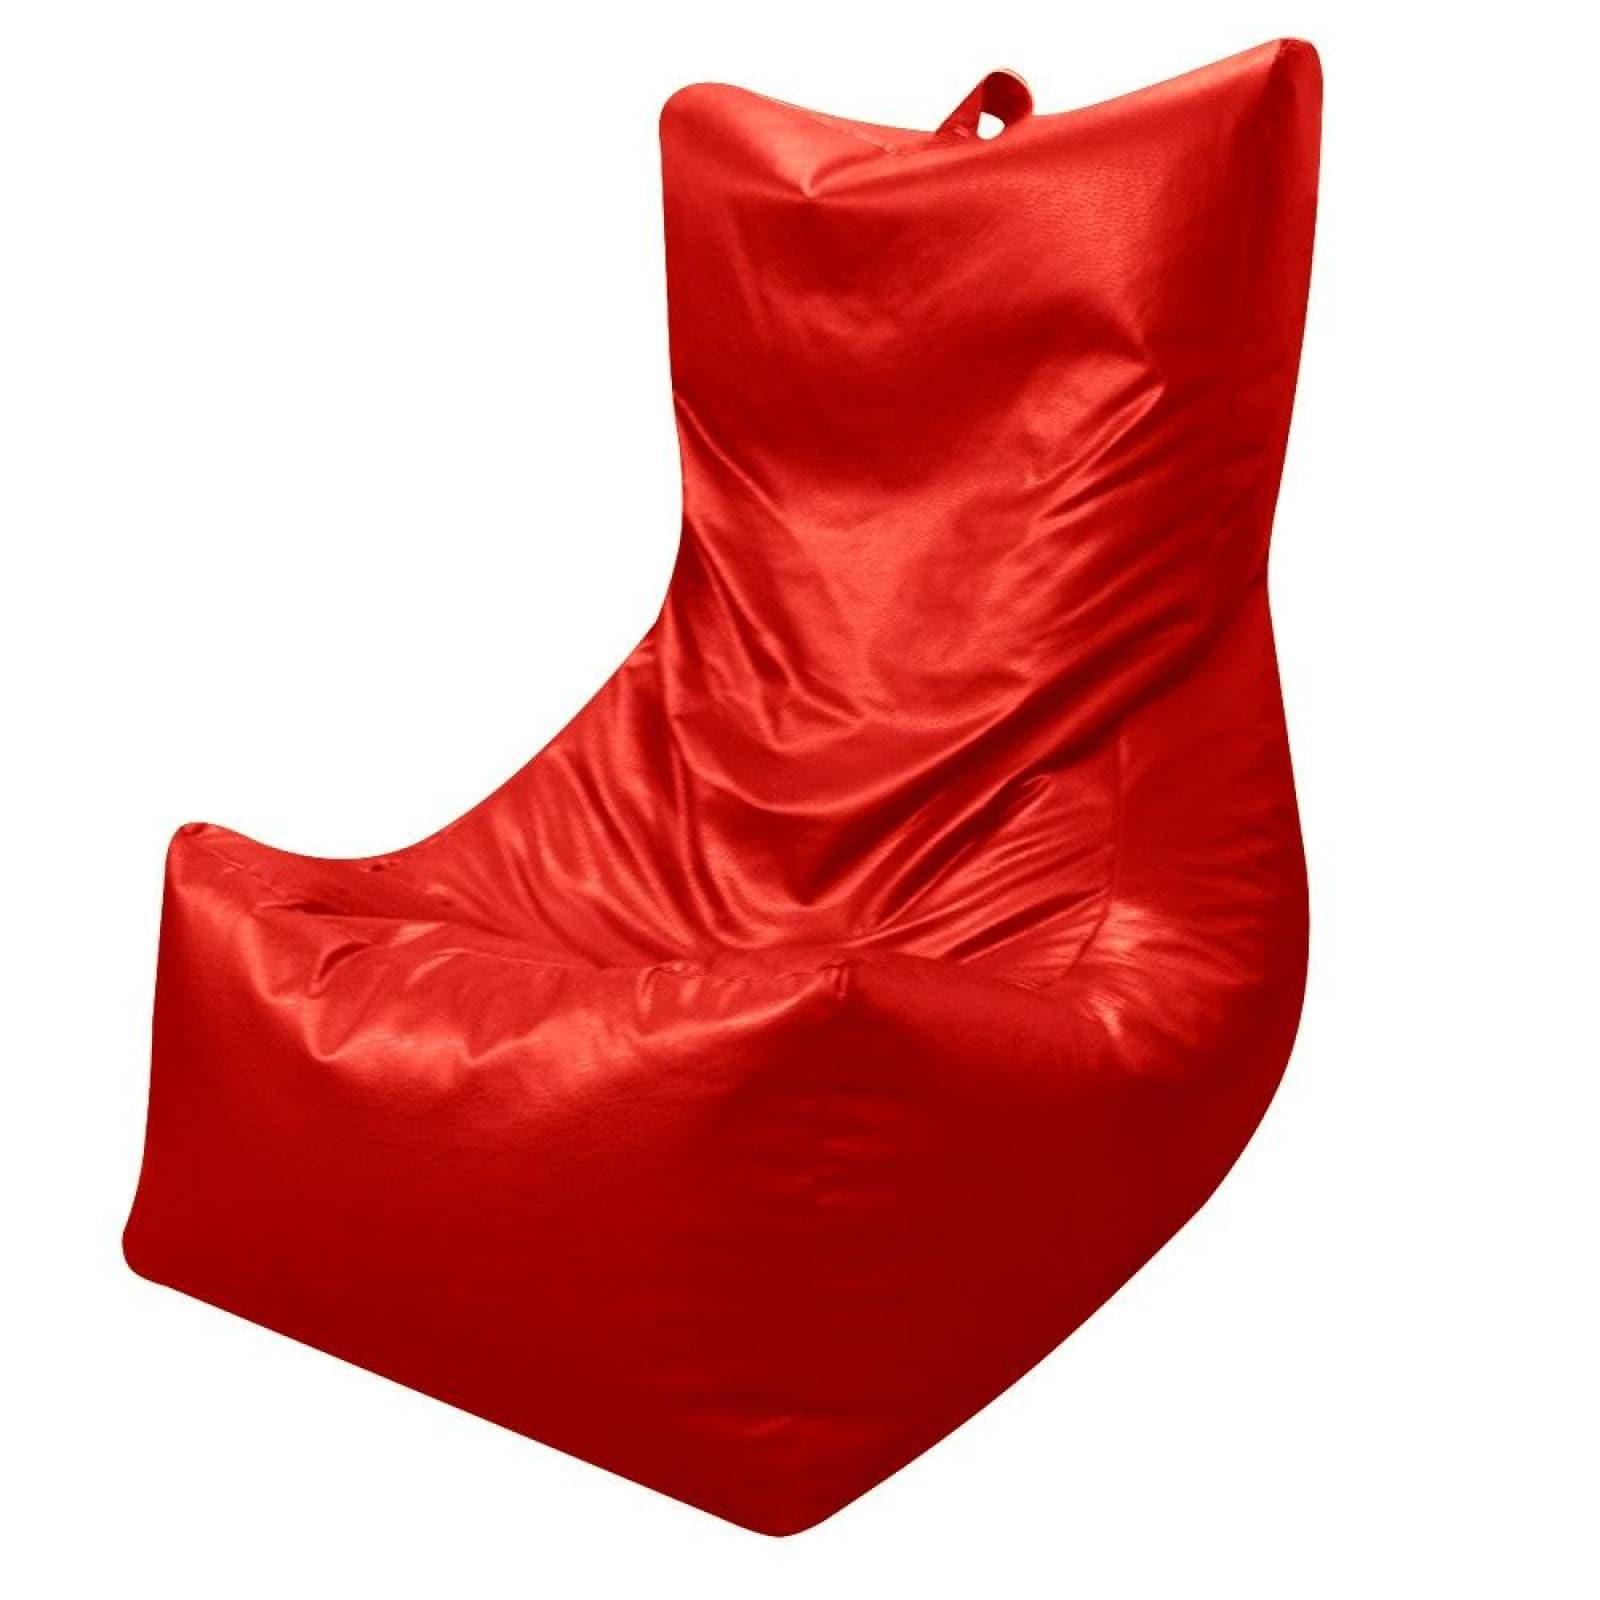 Puff Tipo Sofá Grande Rojo Lunics